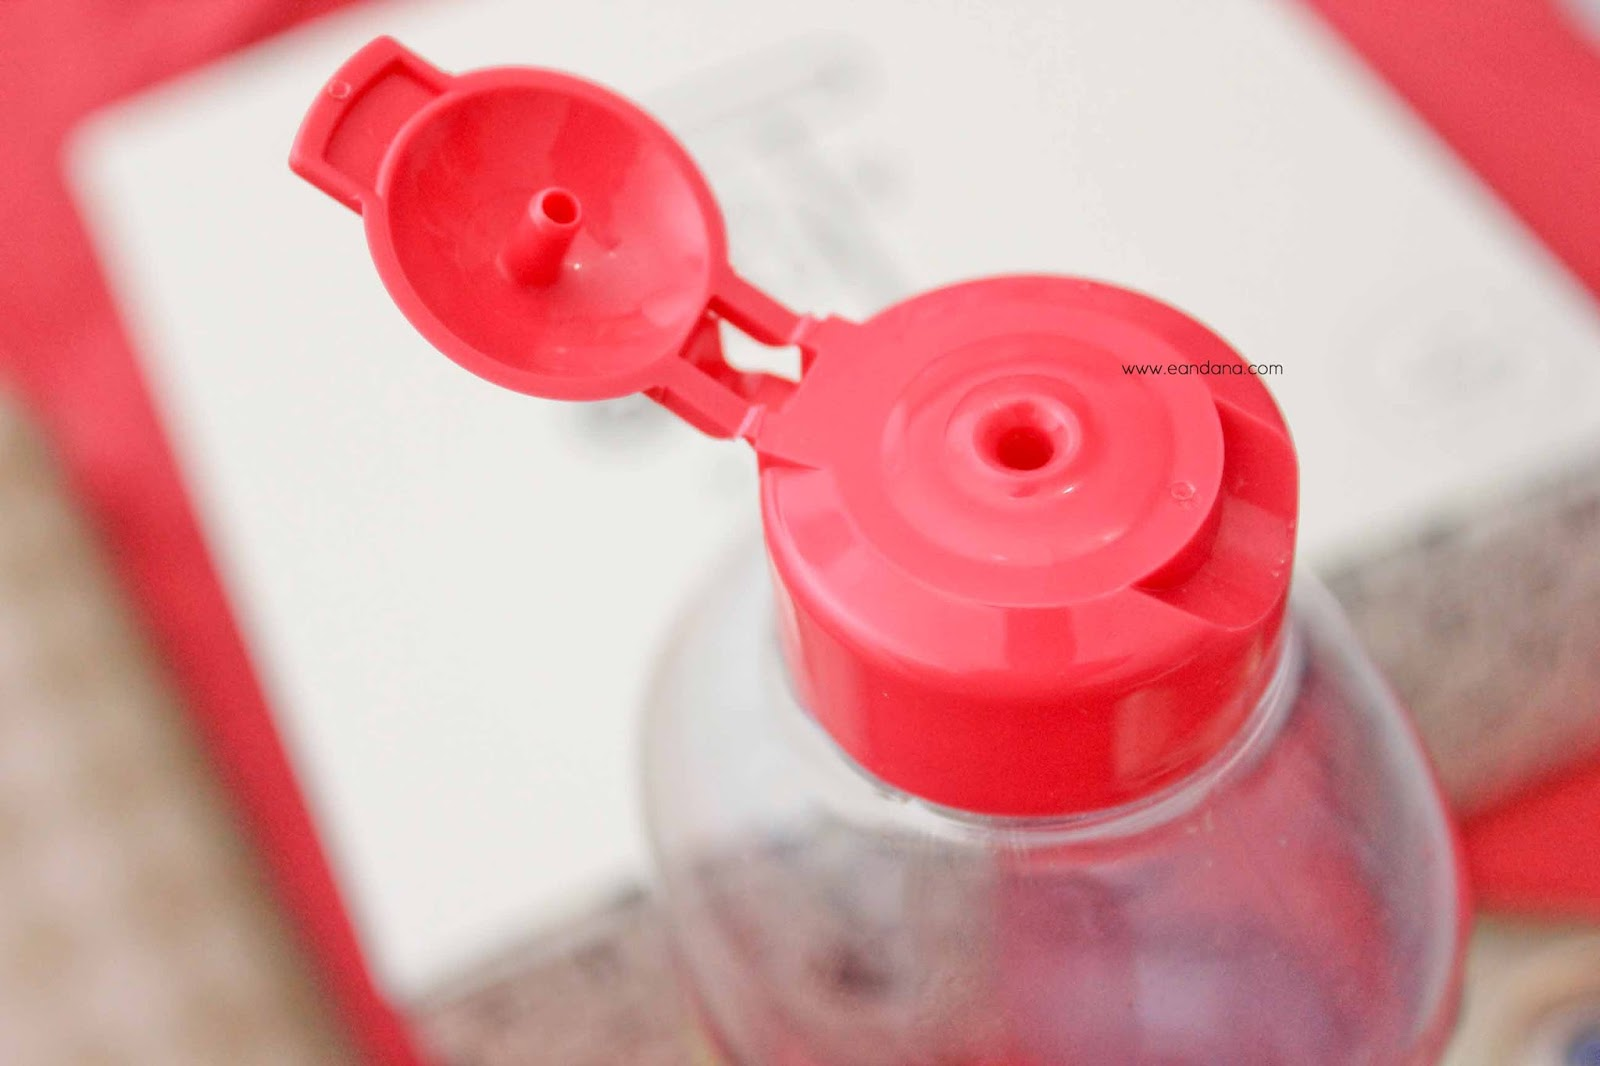 garnier micellar water lid